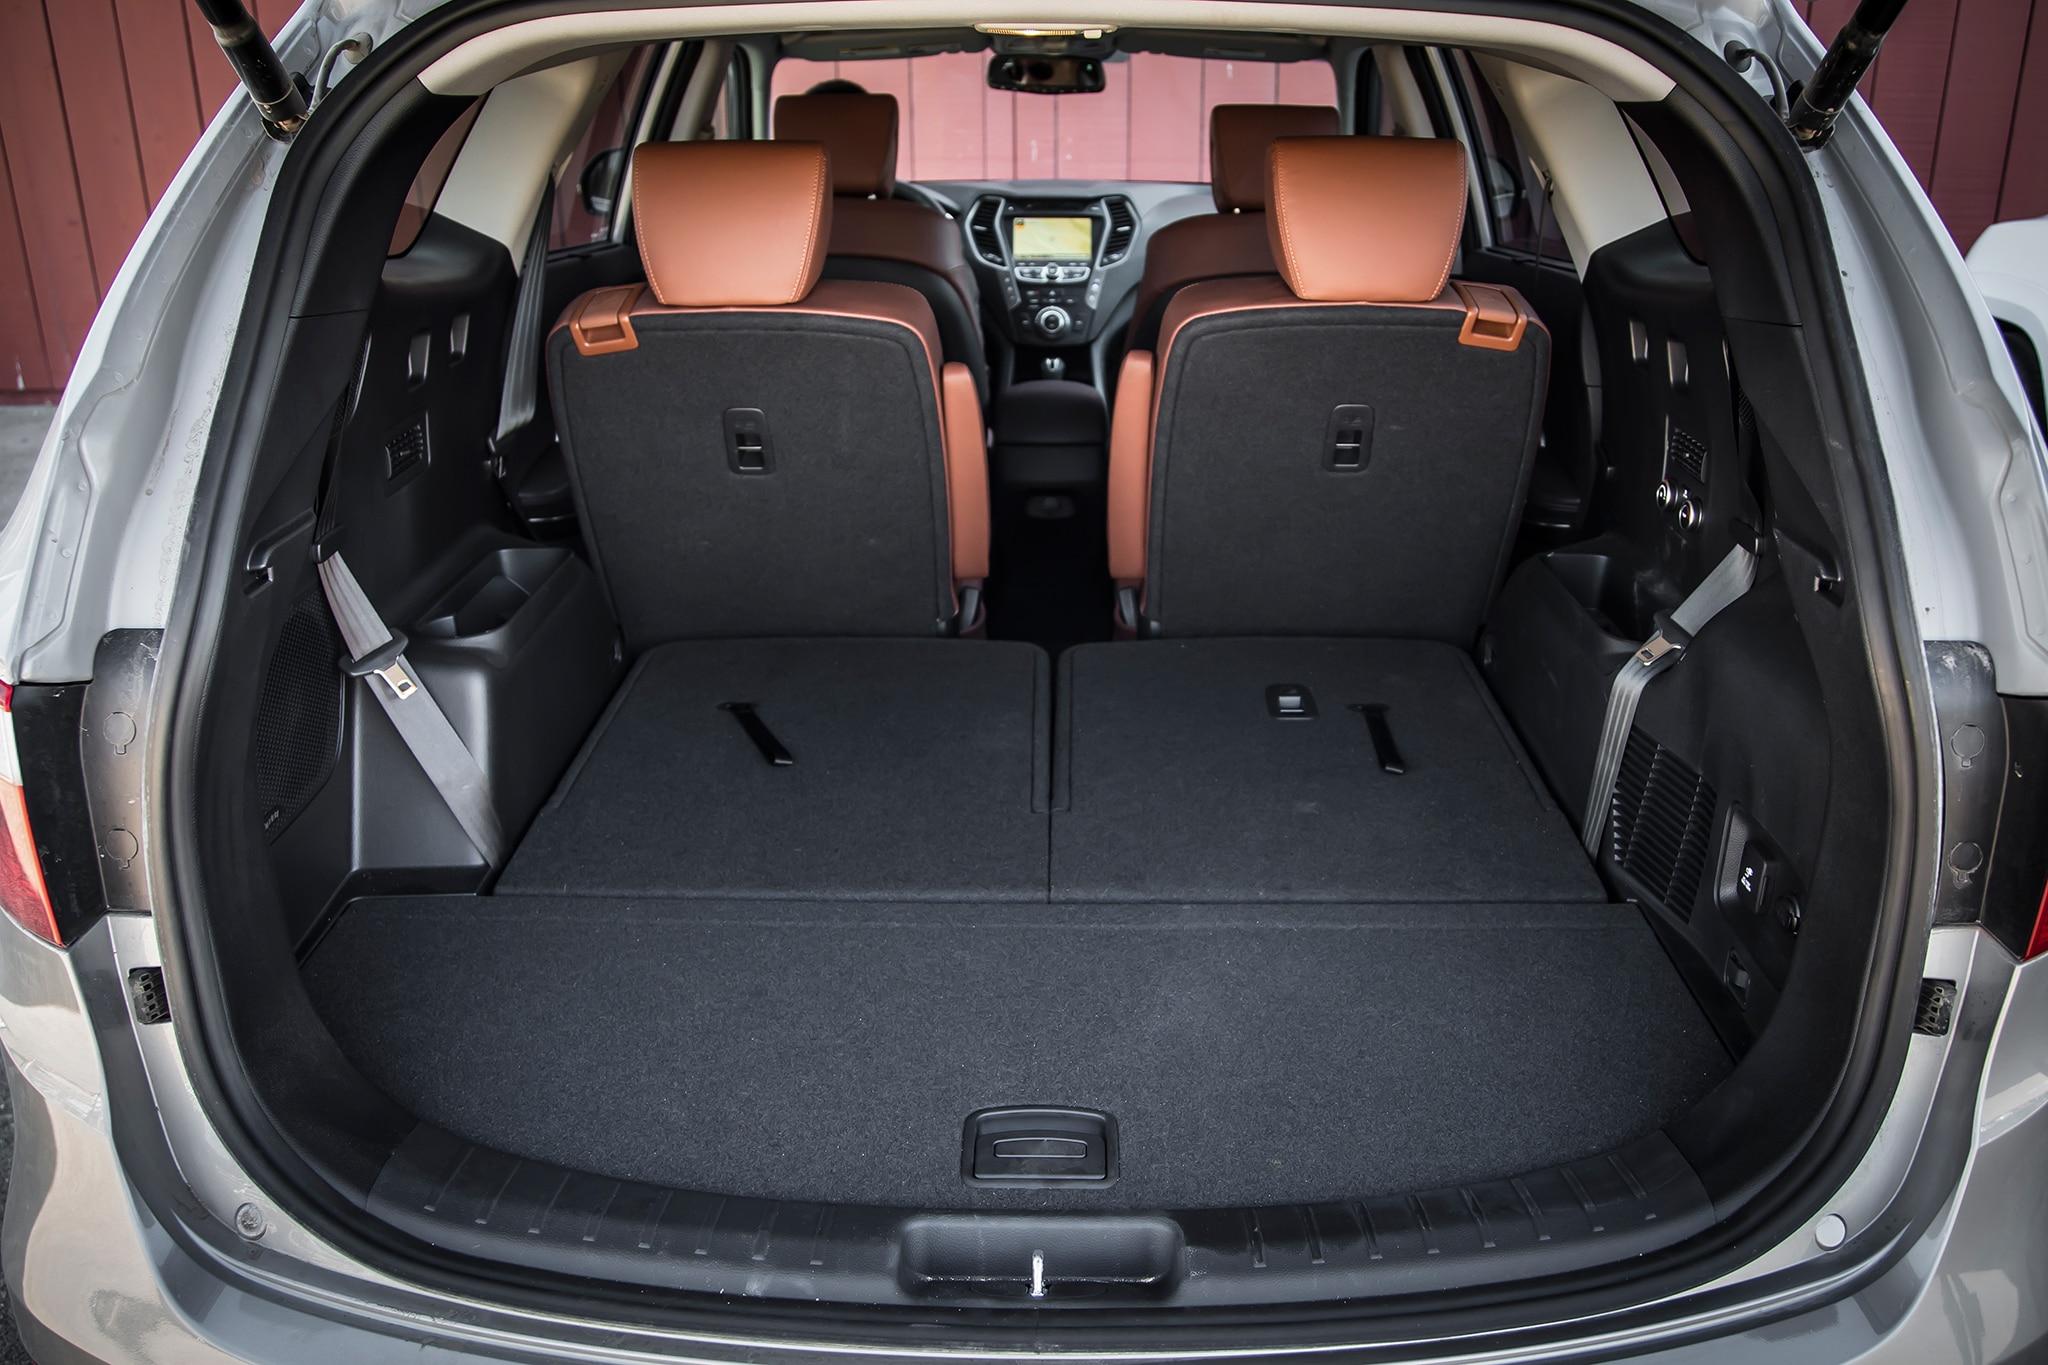 hyundai santa fe primera prueba autos terra motor trend. Black Bedroom Furniture Sets. Home Design Ideas